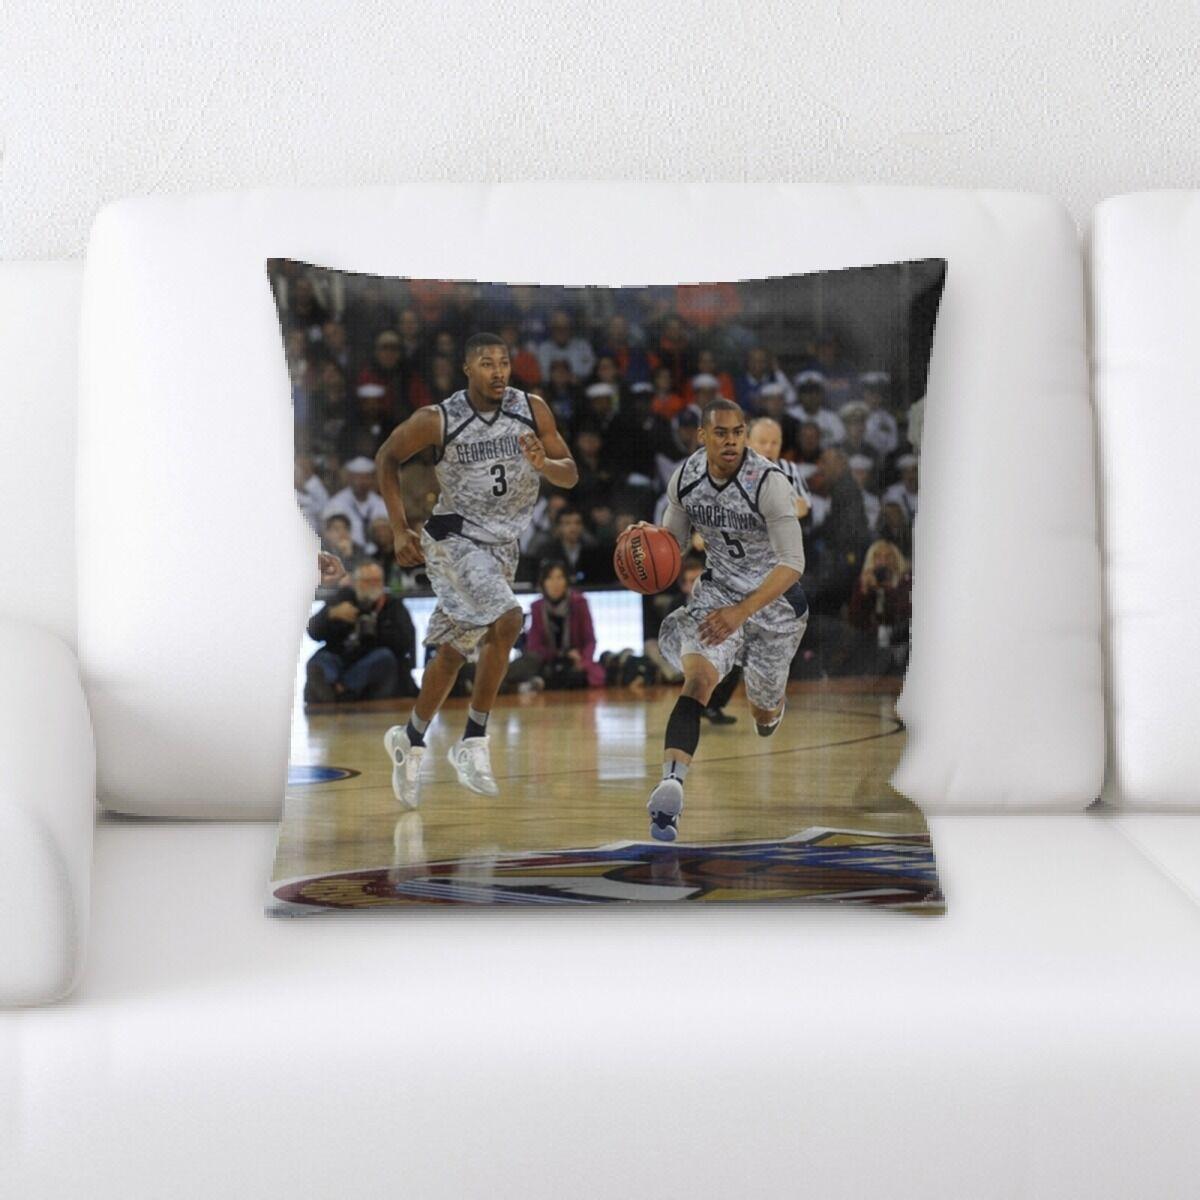 Drummond Basketball Game Throw Pillow